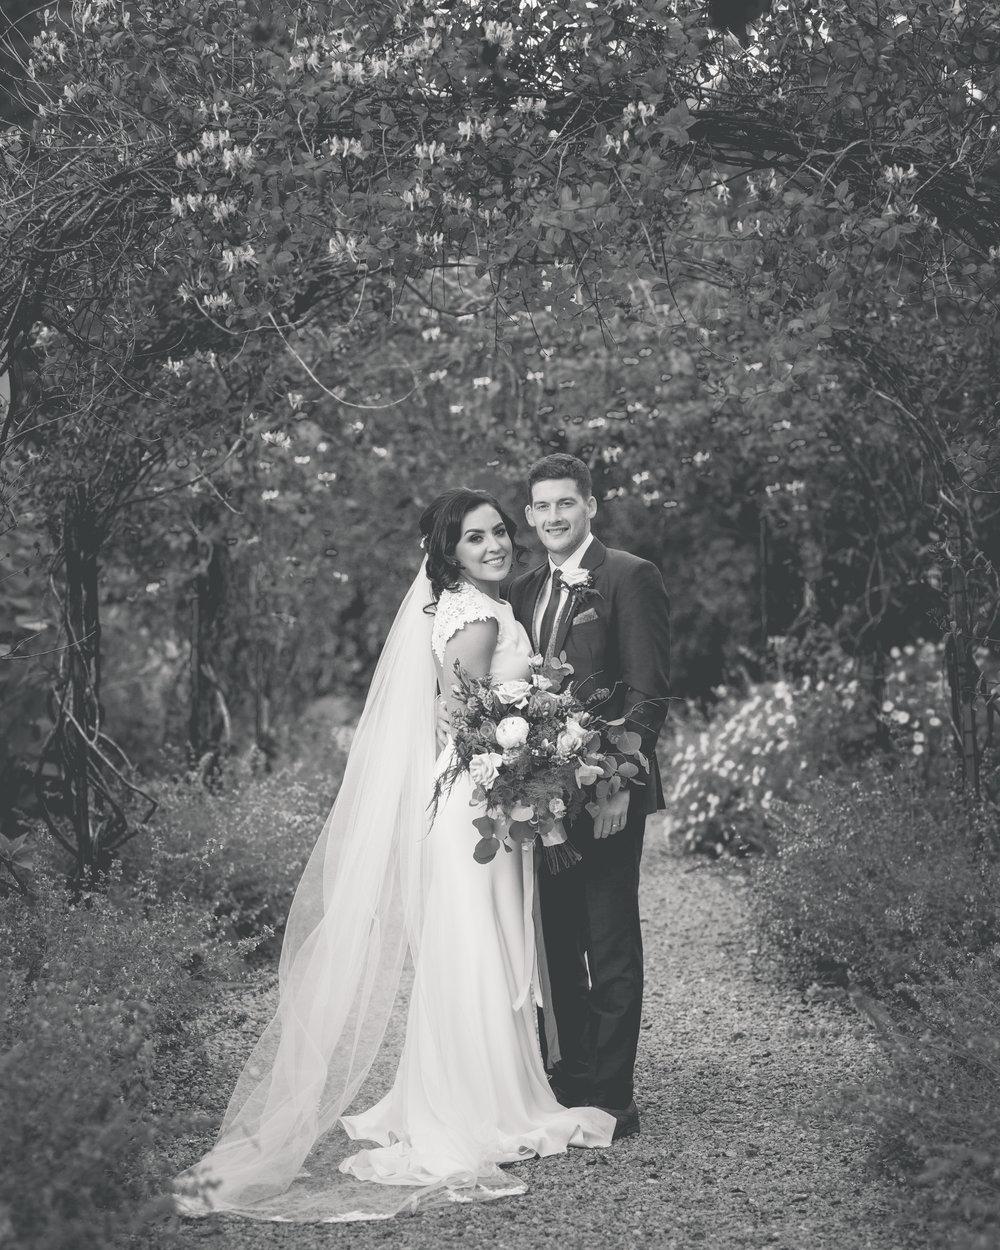 Brian McEwan Wedding Photography | Carol-Anne & Sean | The Portraits-28.jpg